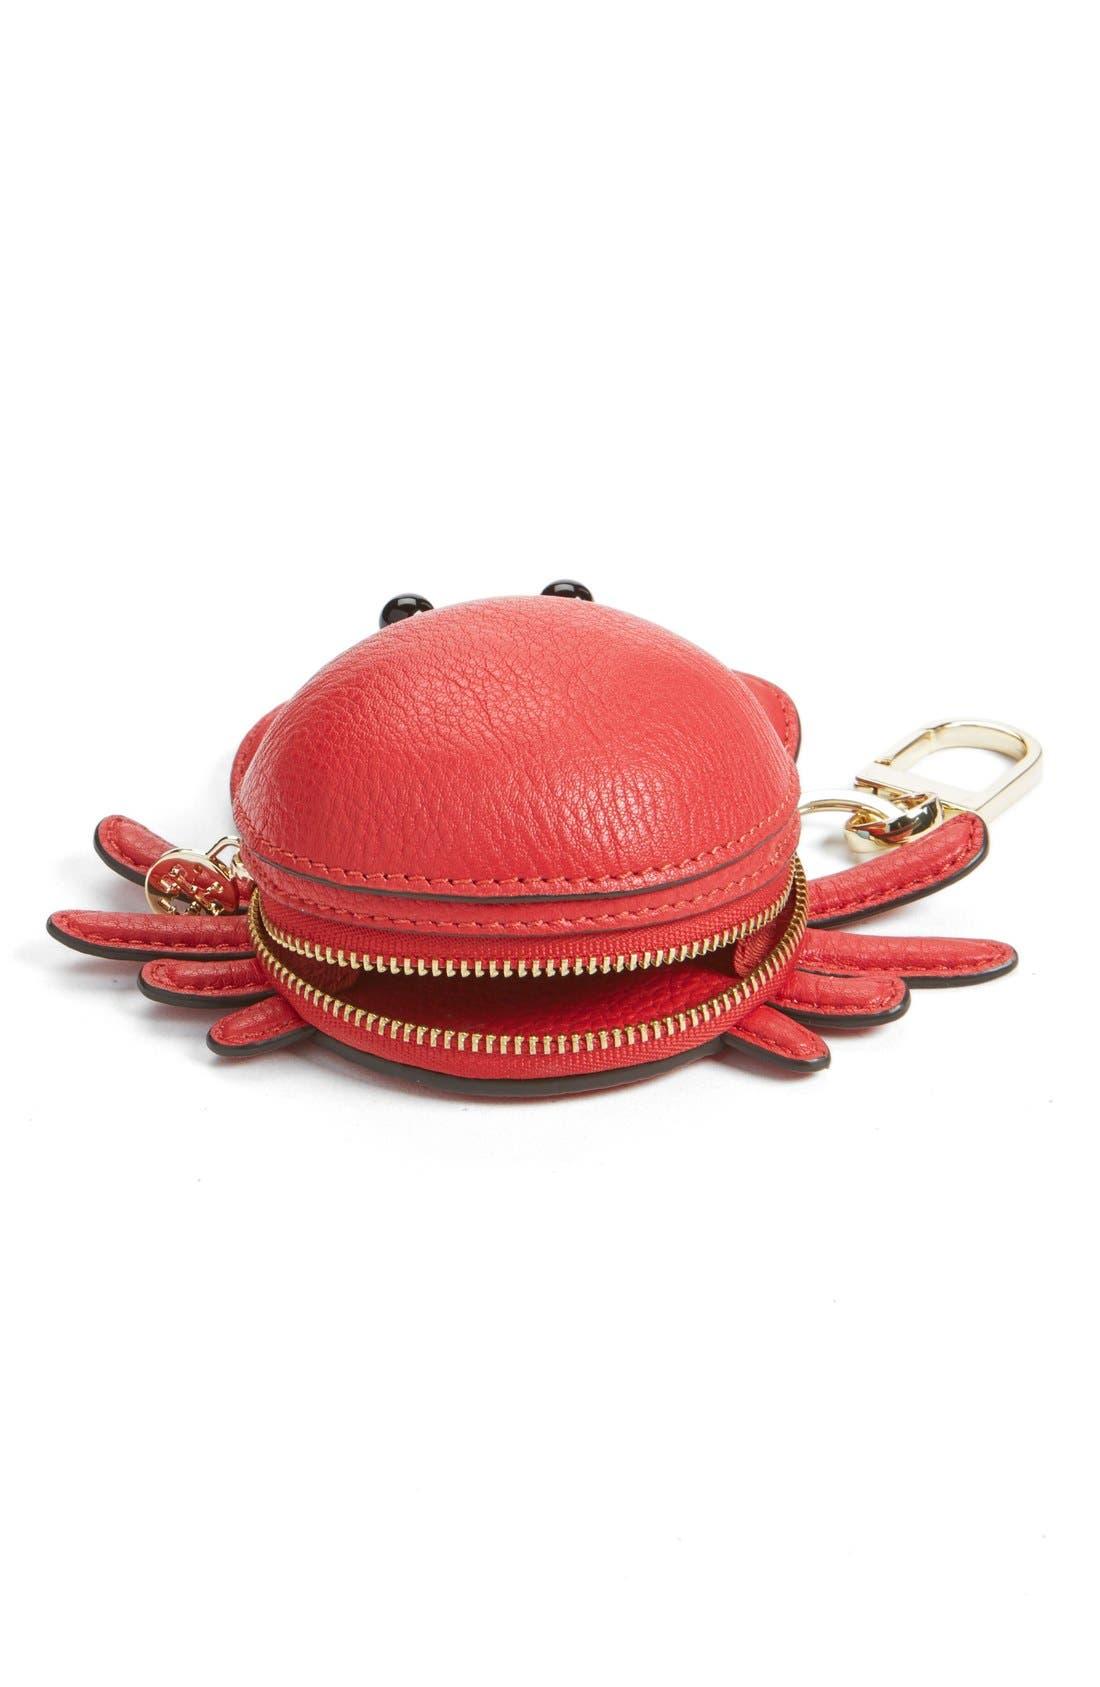 Alternate Image 2  - Tory Burch 'Carl Crab' Coin Pouch Bag Charm